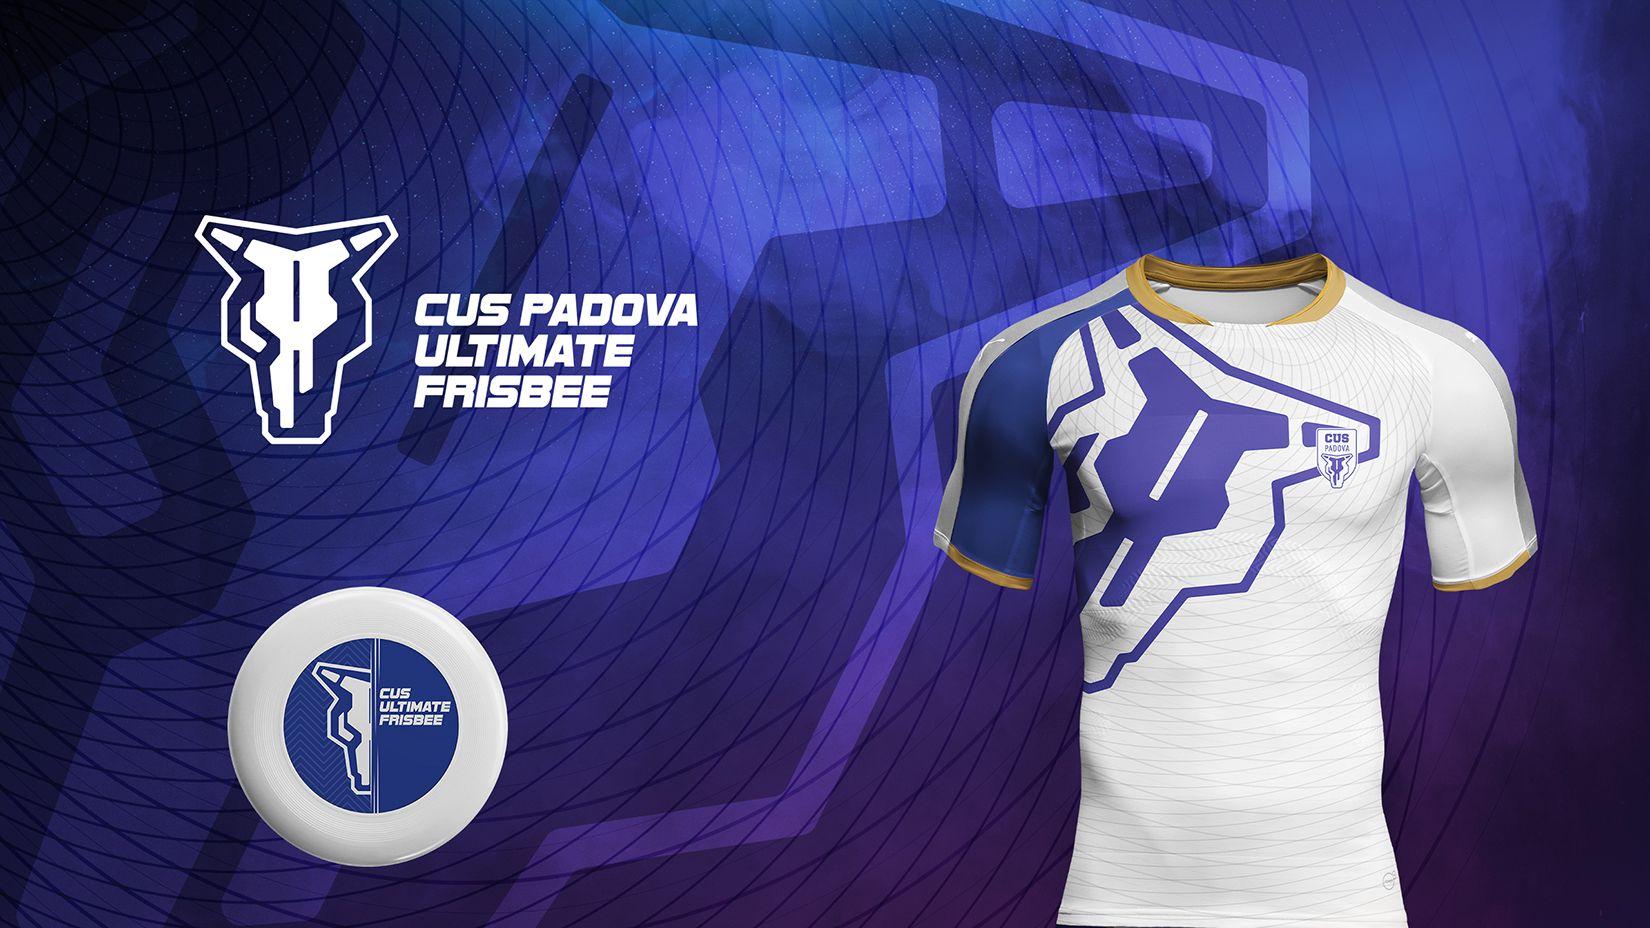 Grafica Pubblicitaria Design-Kit-Gara Cus-Padova-Ultimate-Freesbee 01